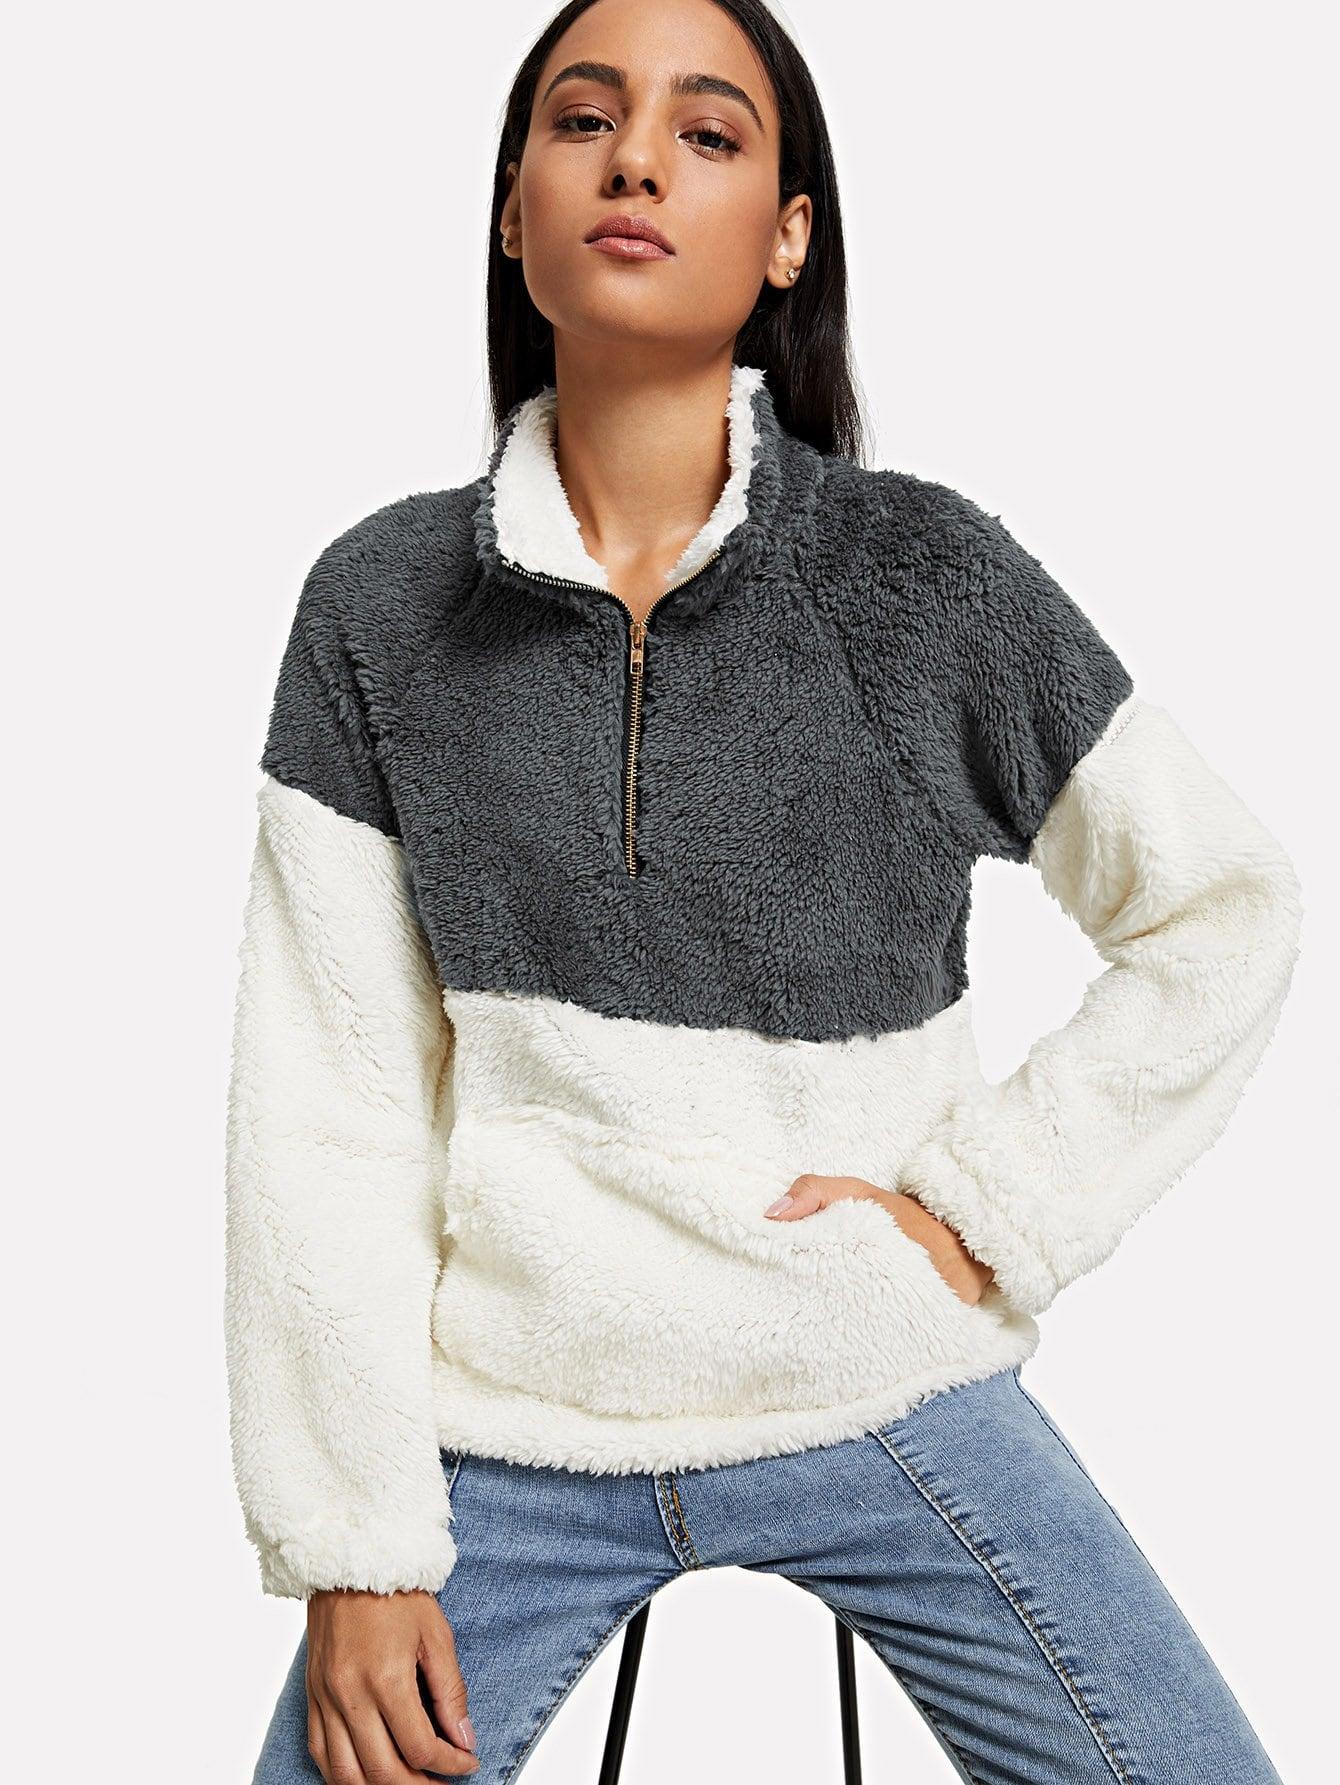 Kangaroo Pocket Drop Shoulder Color Block Sweatshirt mayer boch 143 092 дворники пластик 2шт 18